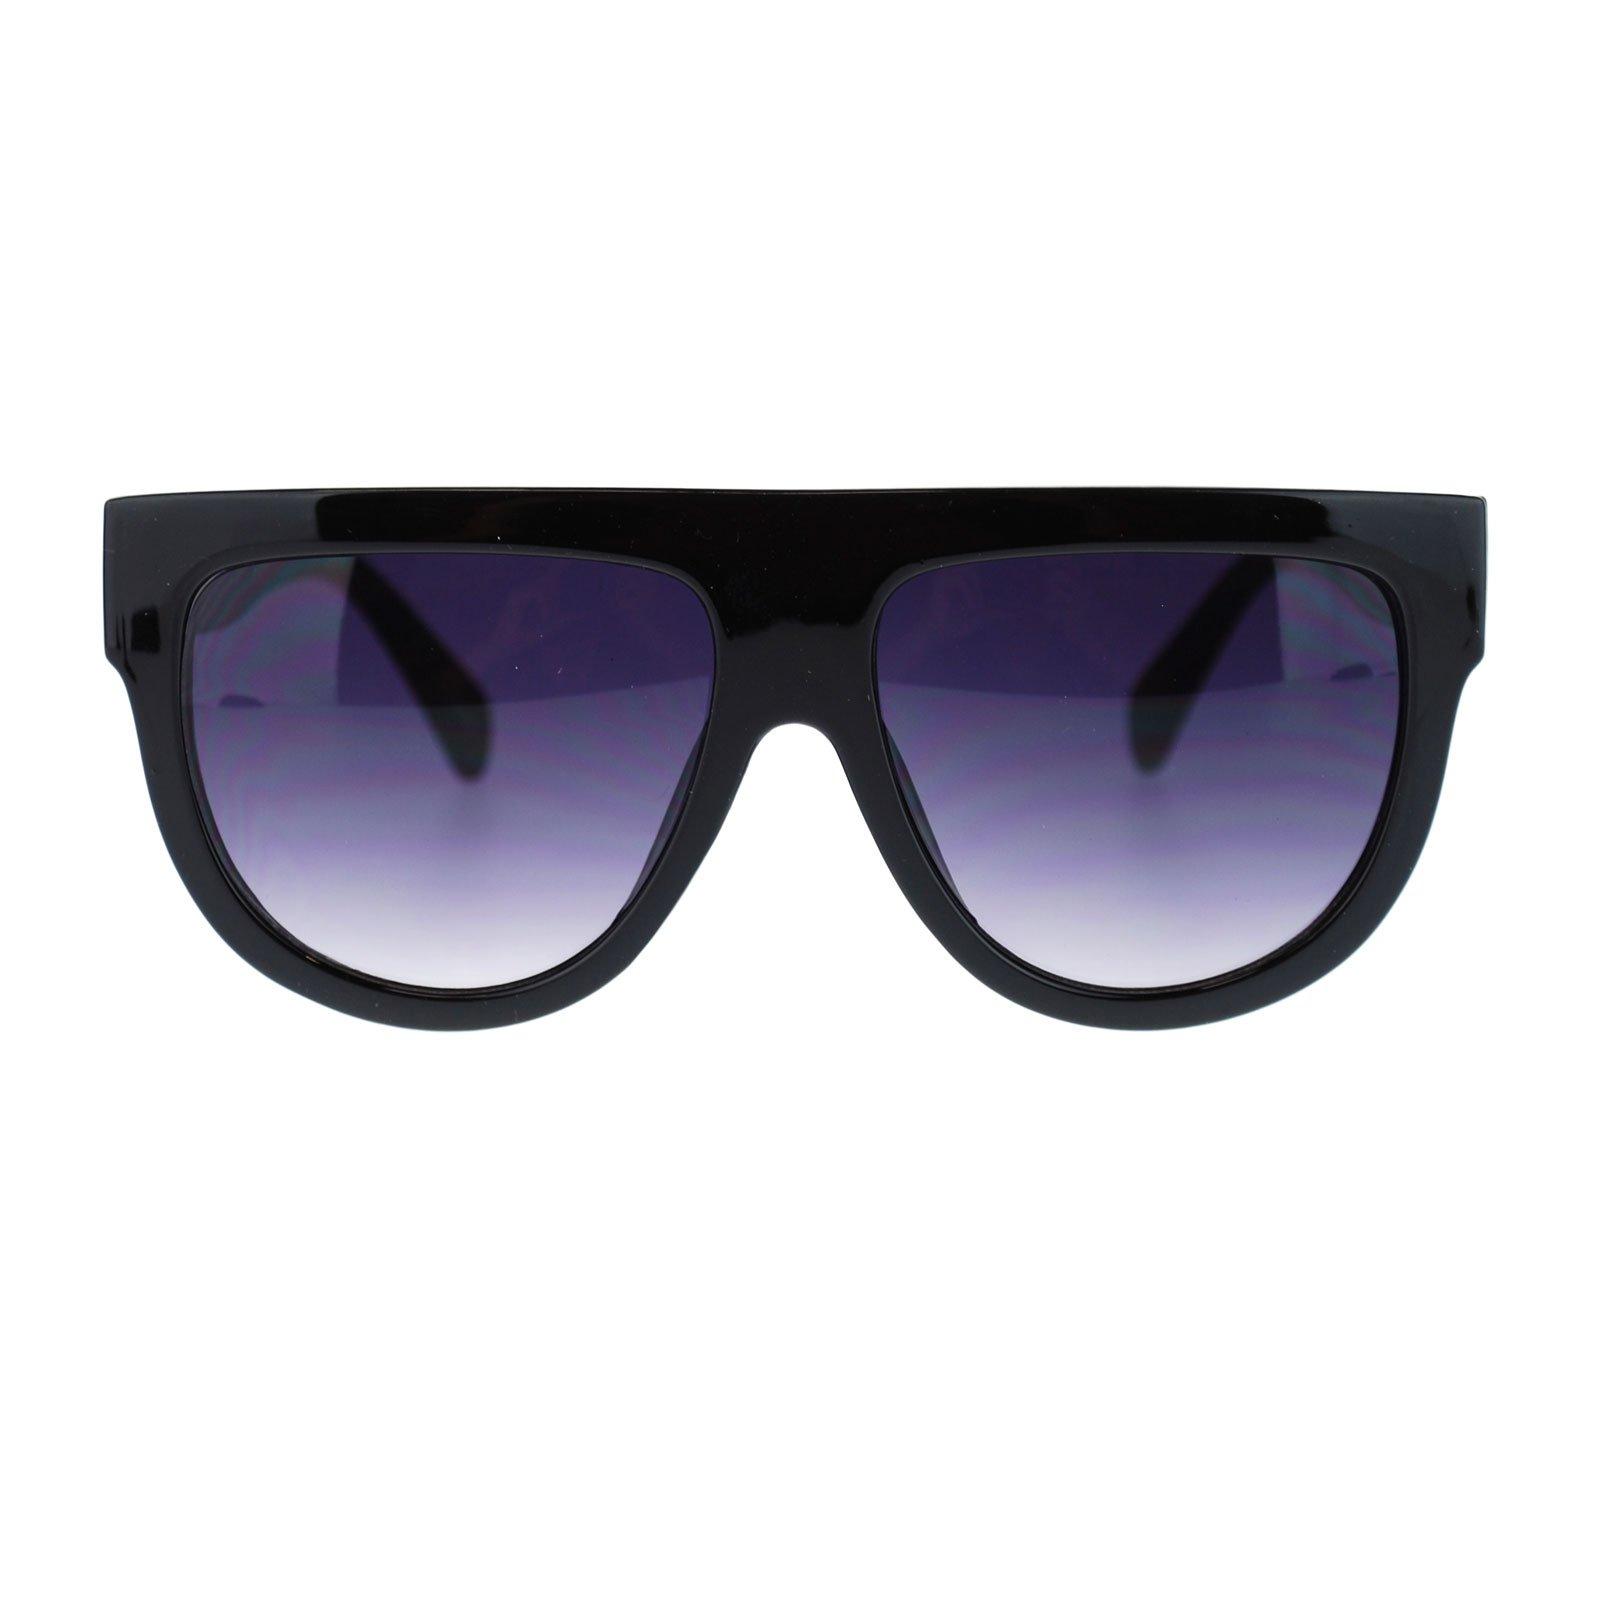 Womens Flat Top Thick Plastic Oversize Boyfriend Fit Sunglasses Black